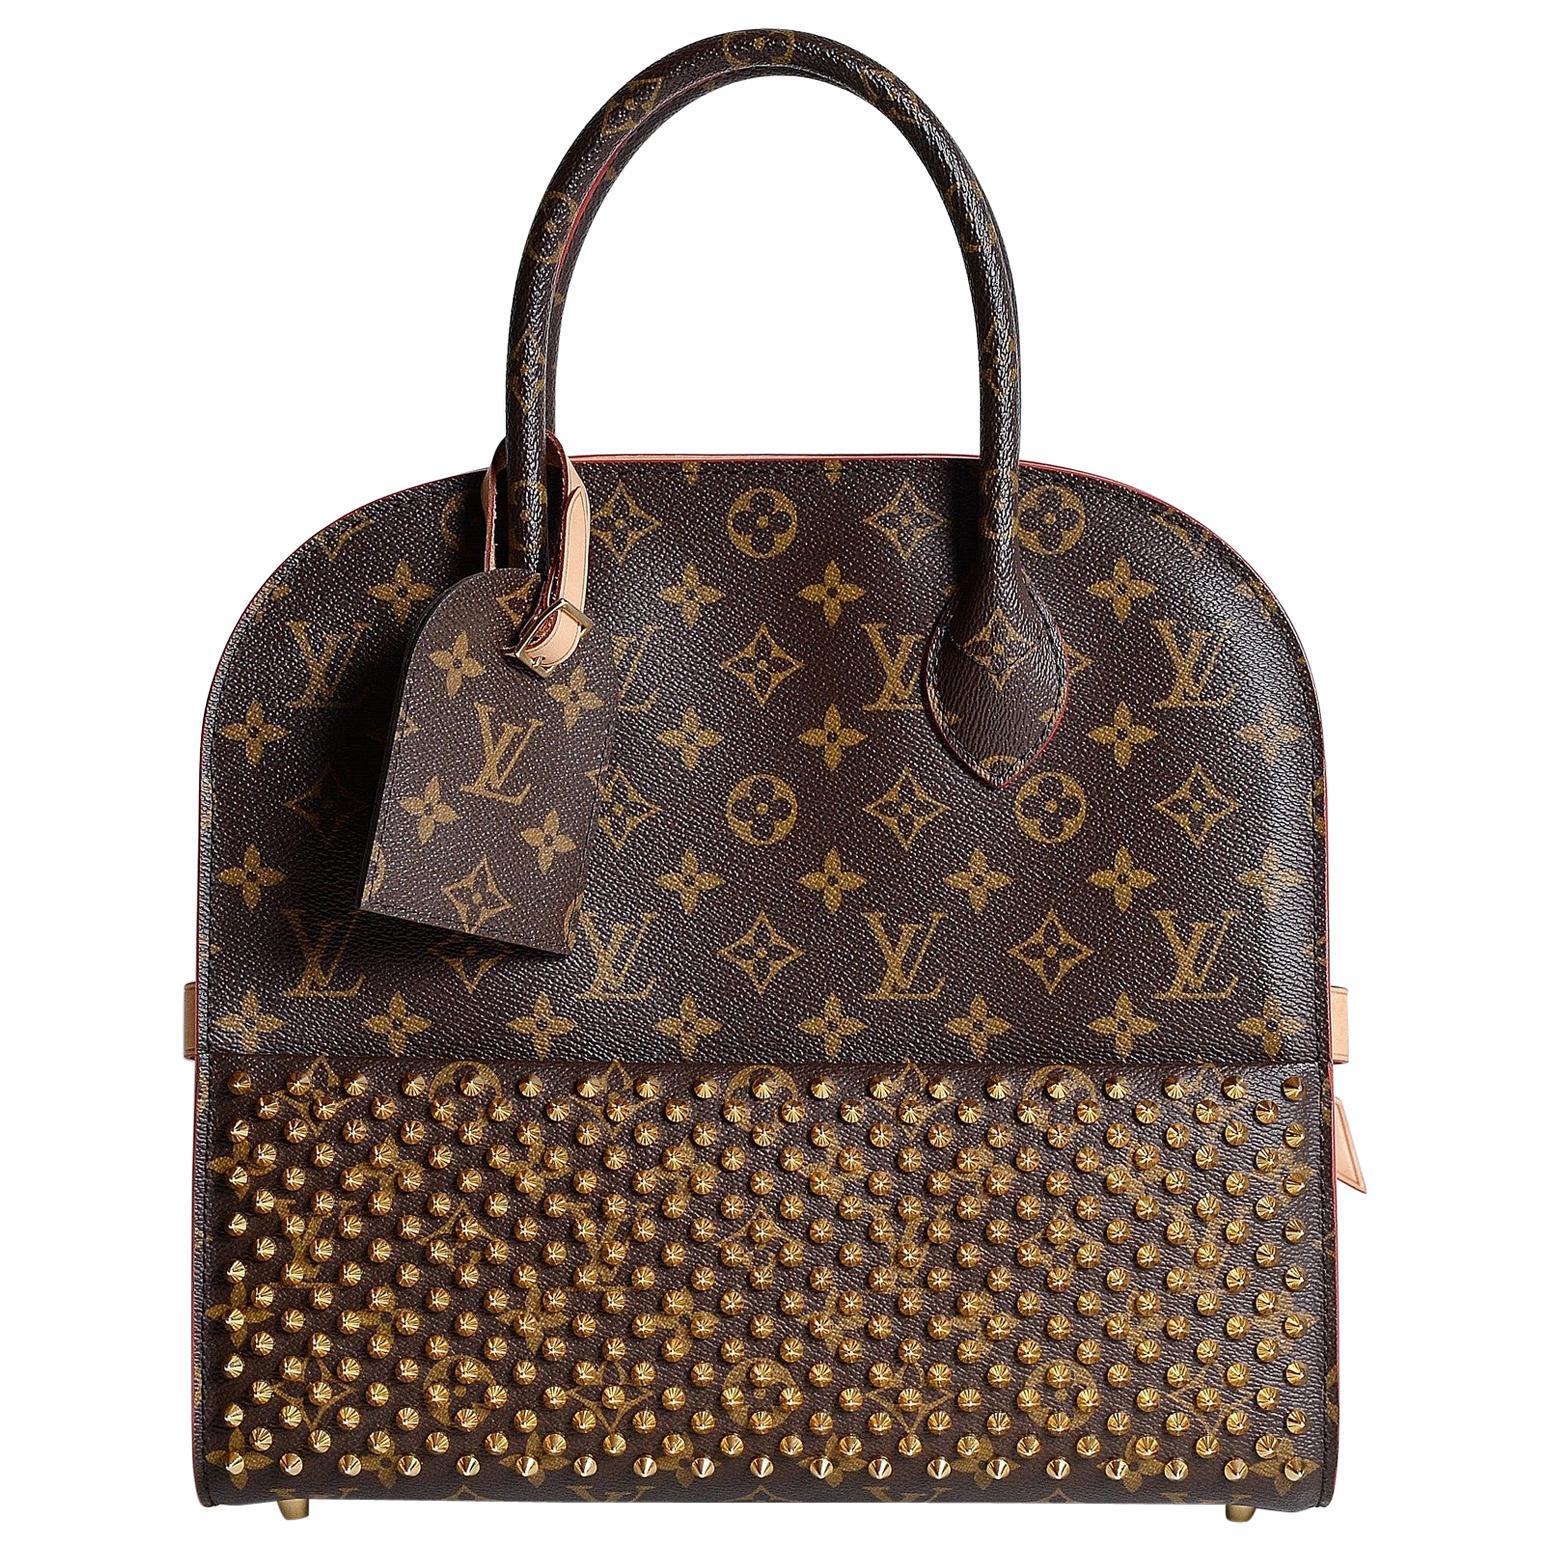 Louis Vuitton Monogram Iconoclast Christian Louboutin bag